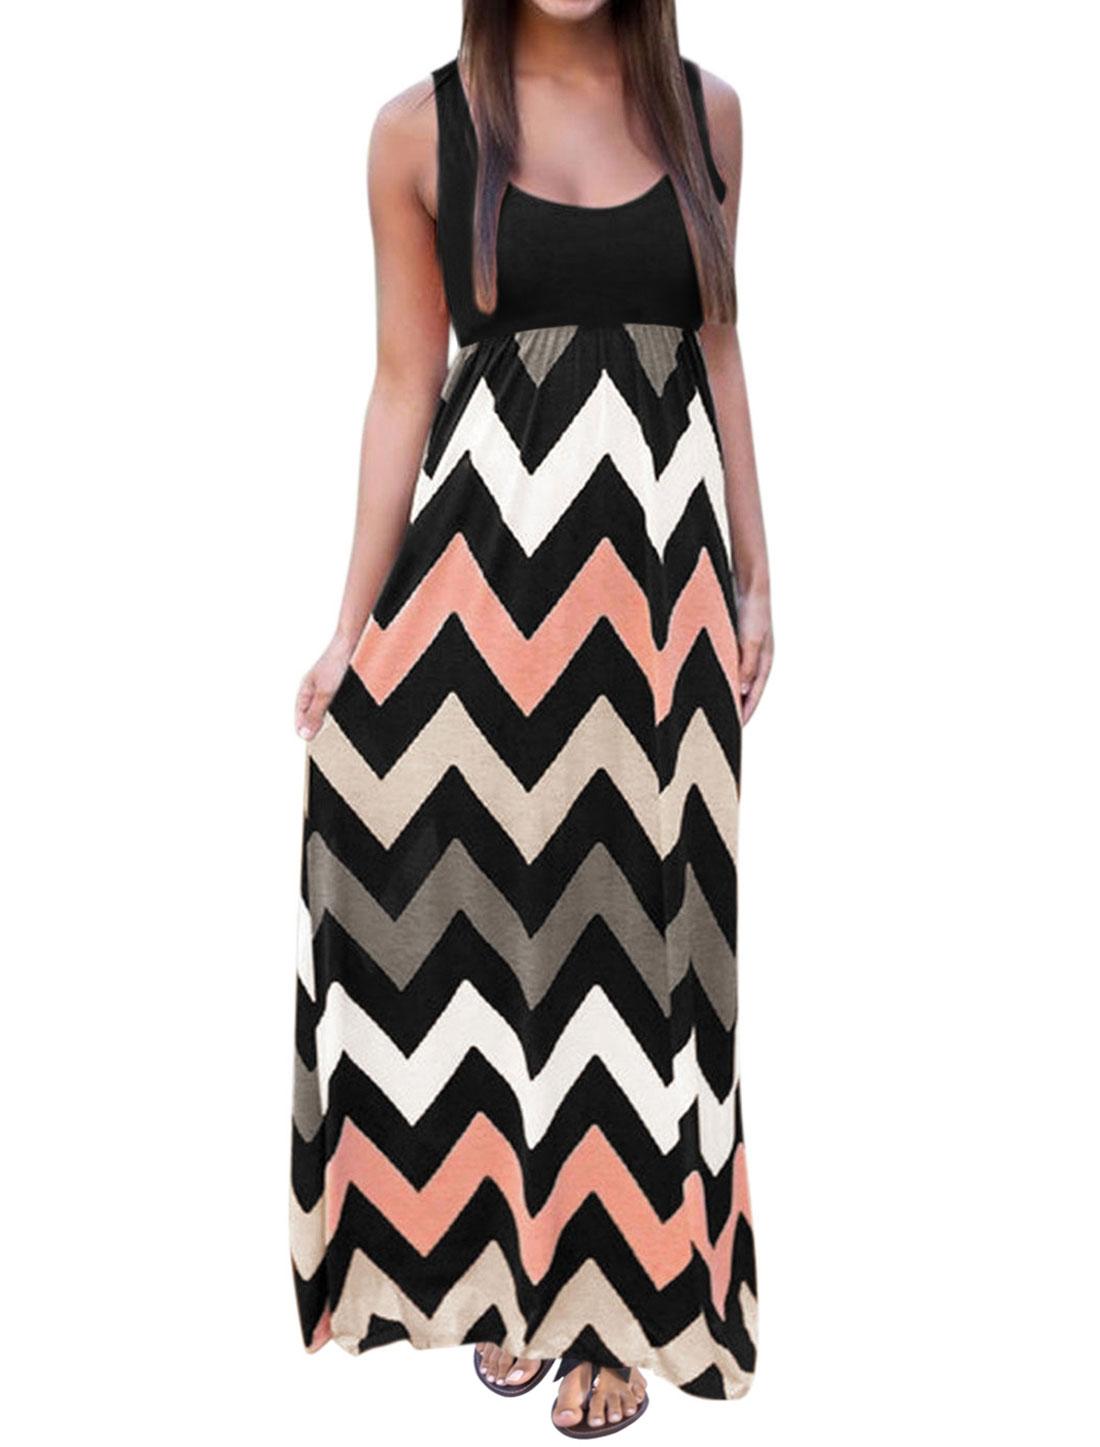 Women Sleeveless Scoop Neck Empire Waist Chevron Maxi Dress Black L